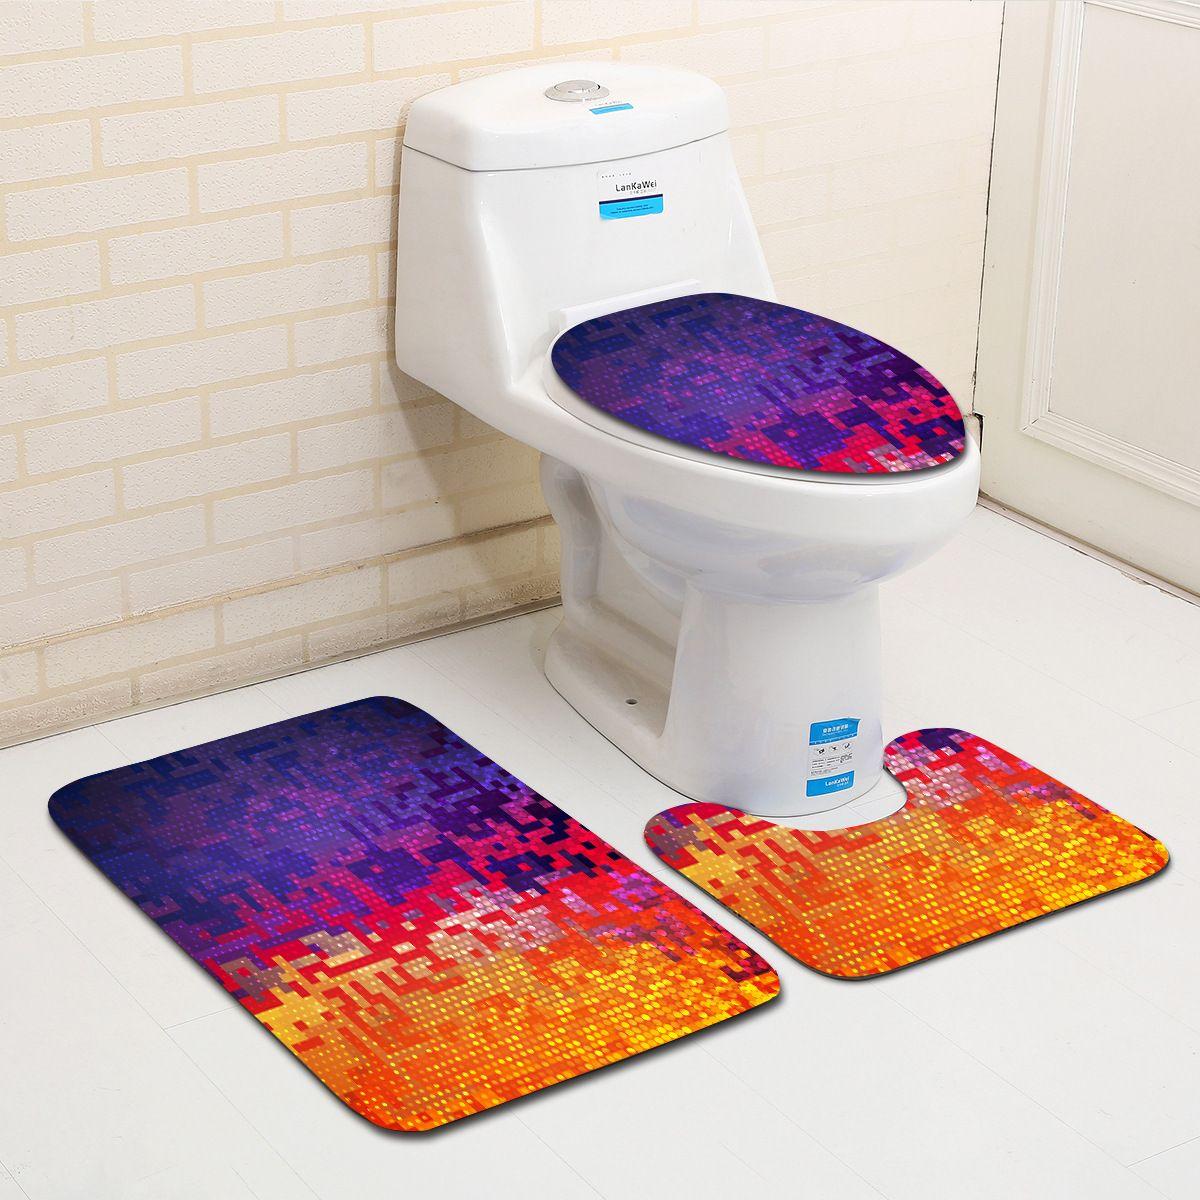 Superieur 2018 Geometric Pattern Bathroom Mat Set Modern Anti Slip Bath Mat Home  Creative Bathroom Rug And Toilet Sets From Adeir, $22.49 | Dhgate.Com